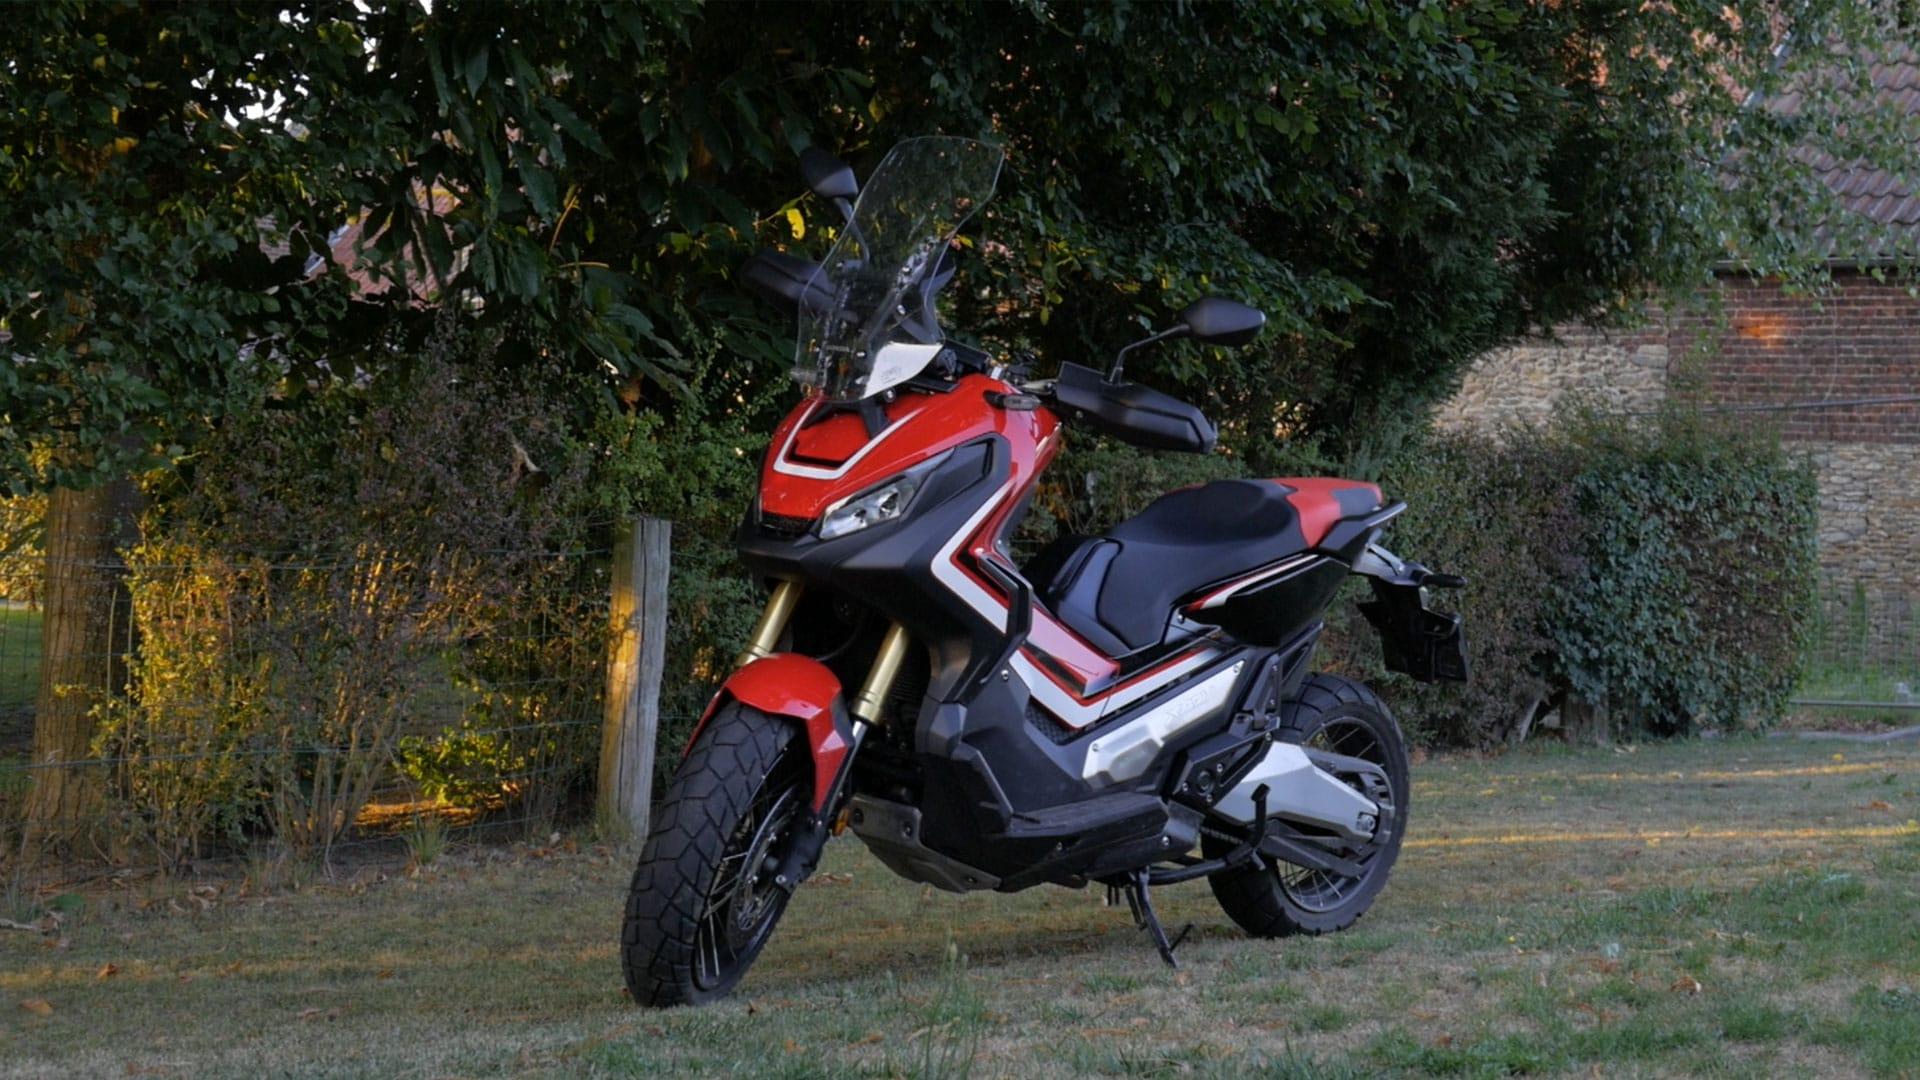 3edbe002921aa Test du Honda X-ADV : mon avis après 1 semaine passée avec - Motard ...